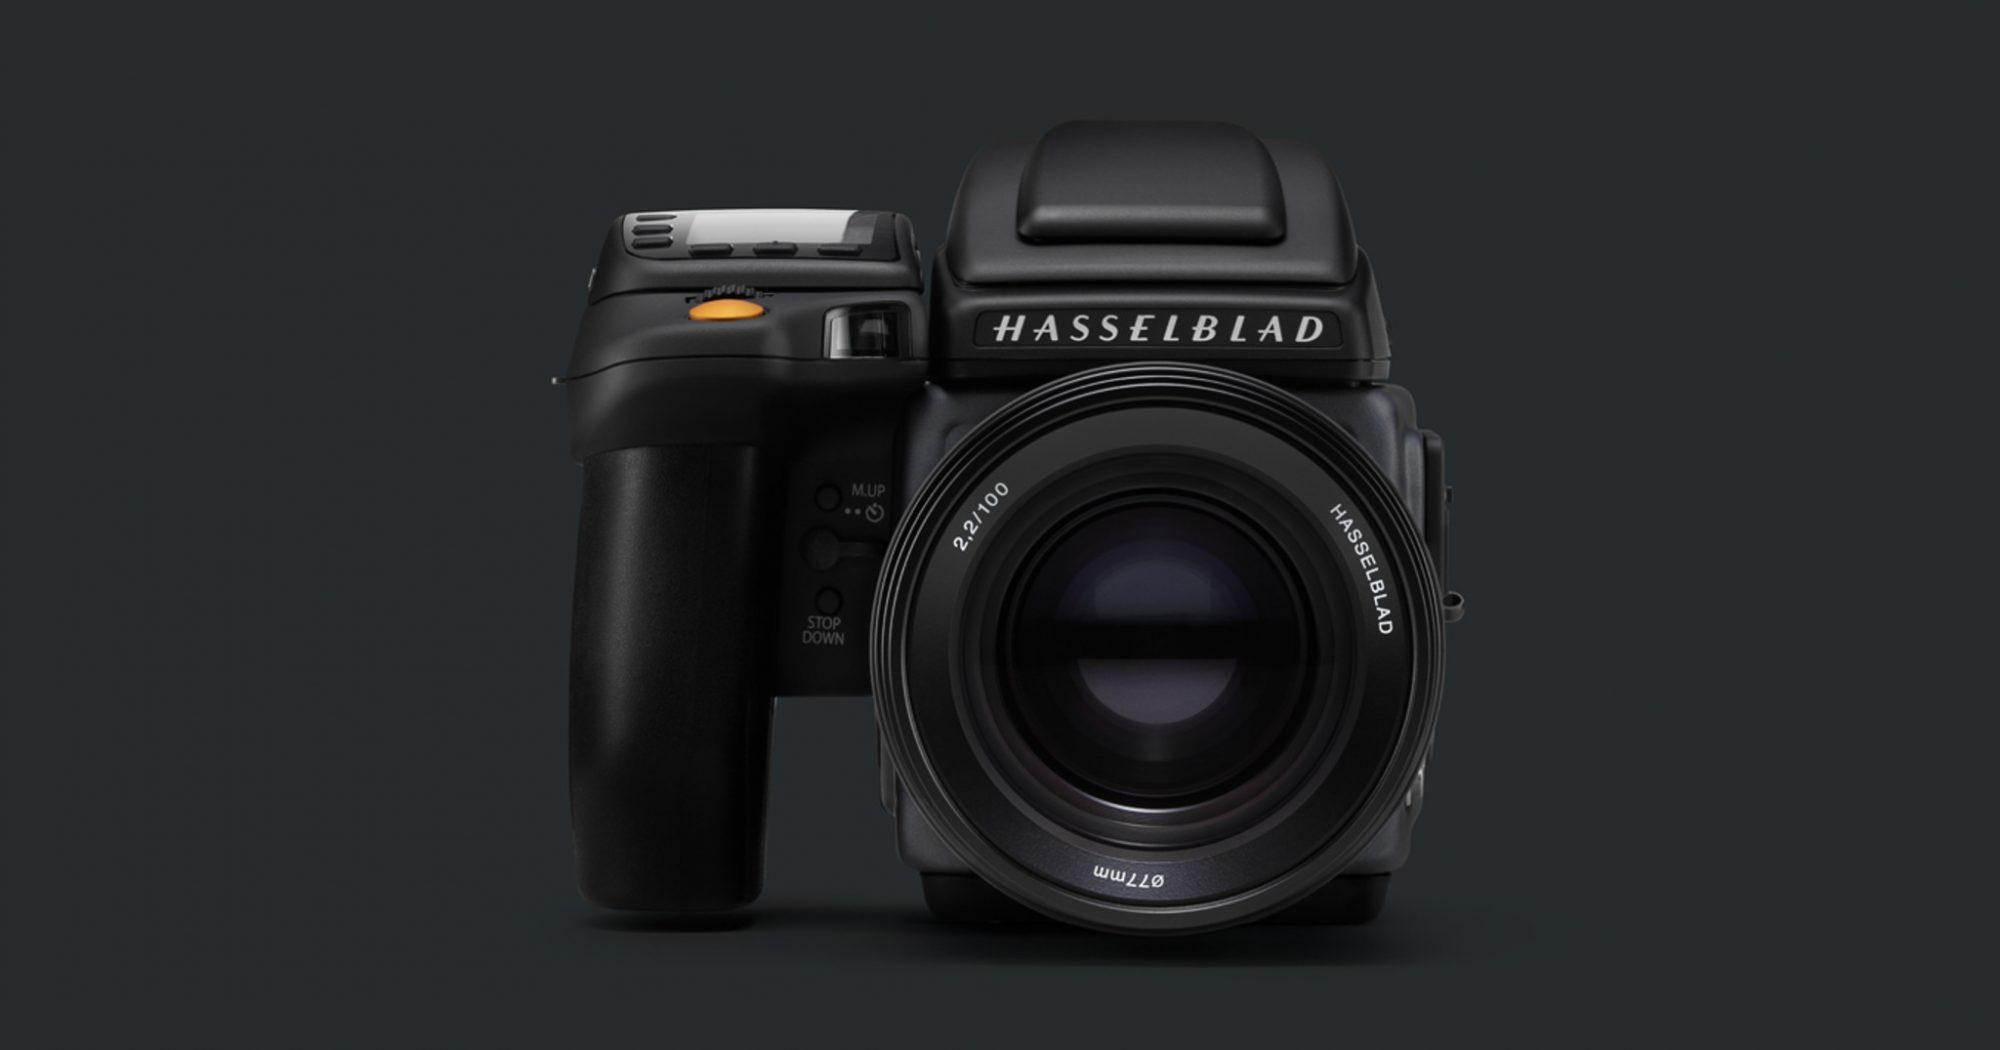 9b07d1b70d ハッセルブラッドは月に最初に行ったカメラとしても有名なスウェーデンのカメラメーカー。ファッションポートレート、広告などのカメラマン御用達のプロ用カメラとして  ...